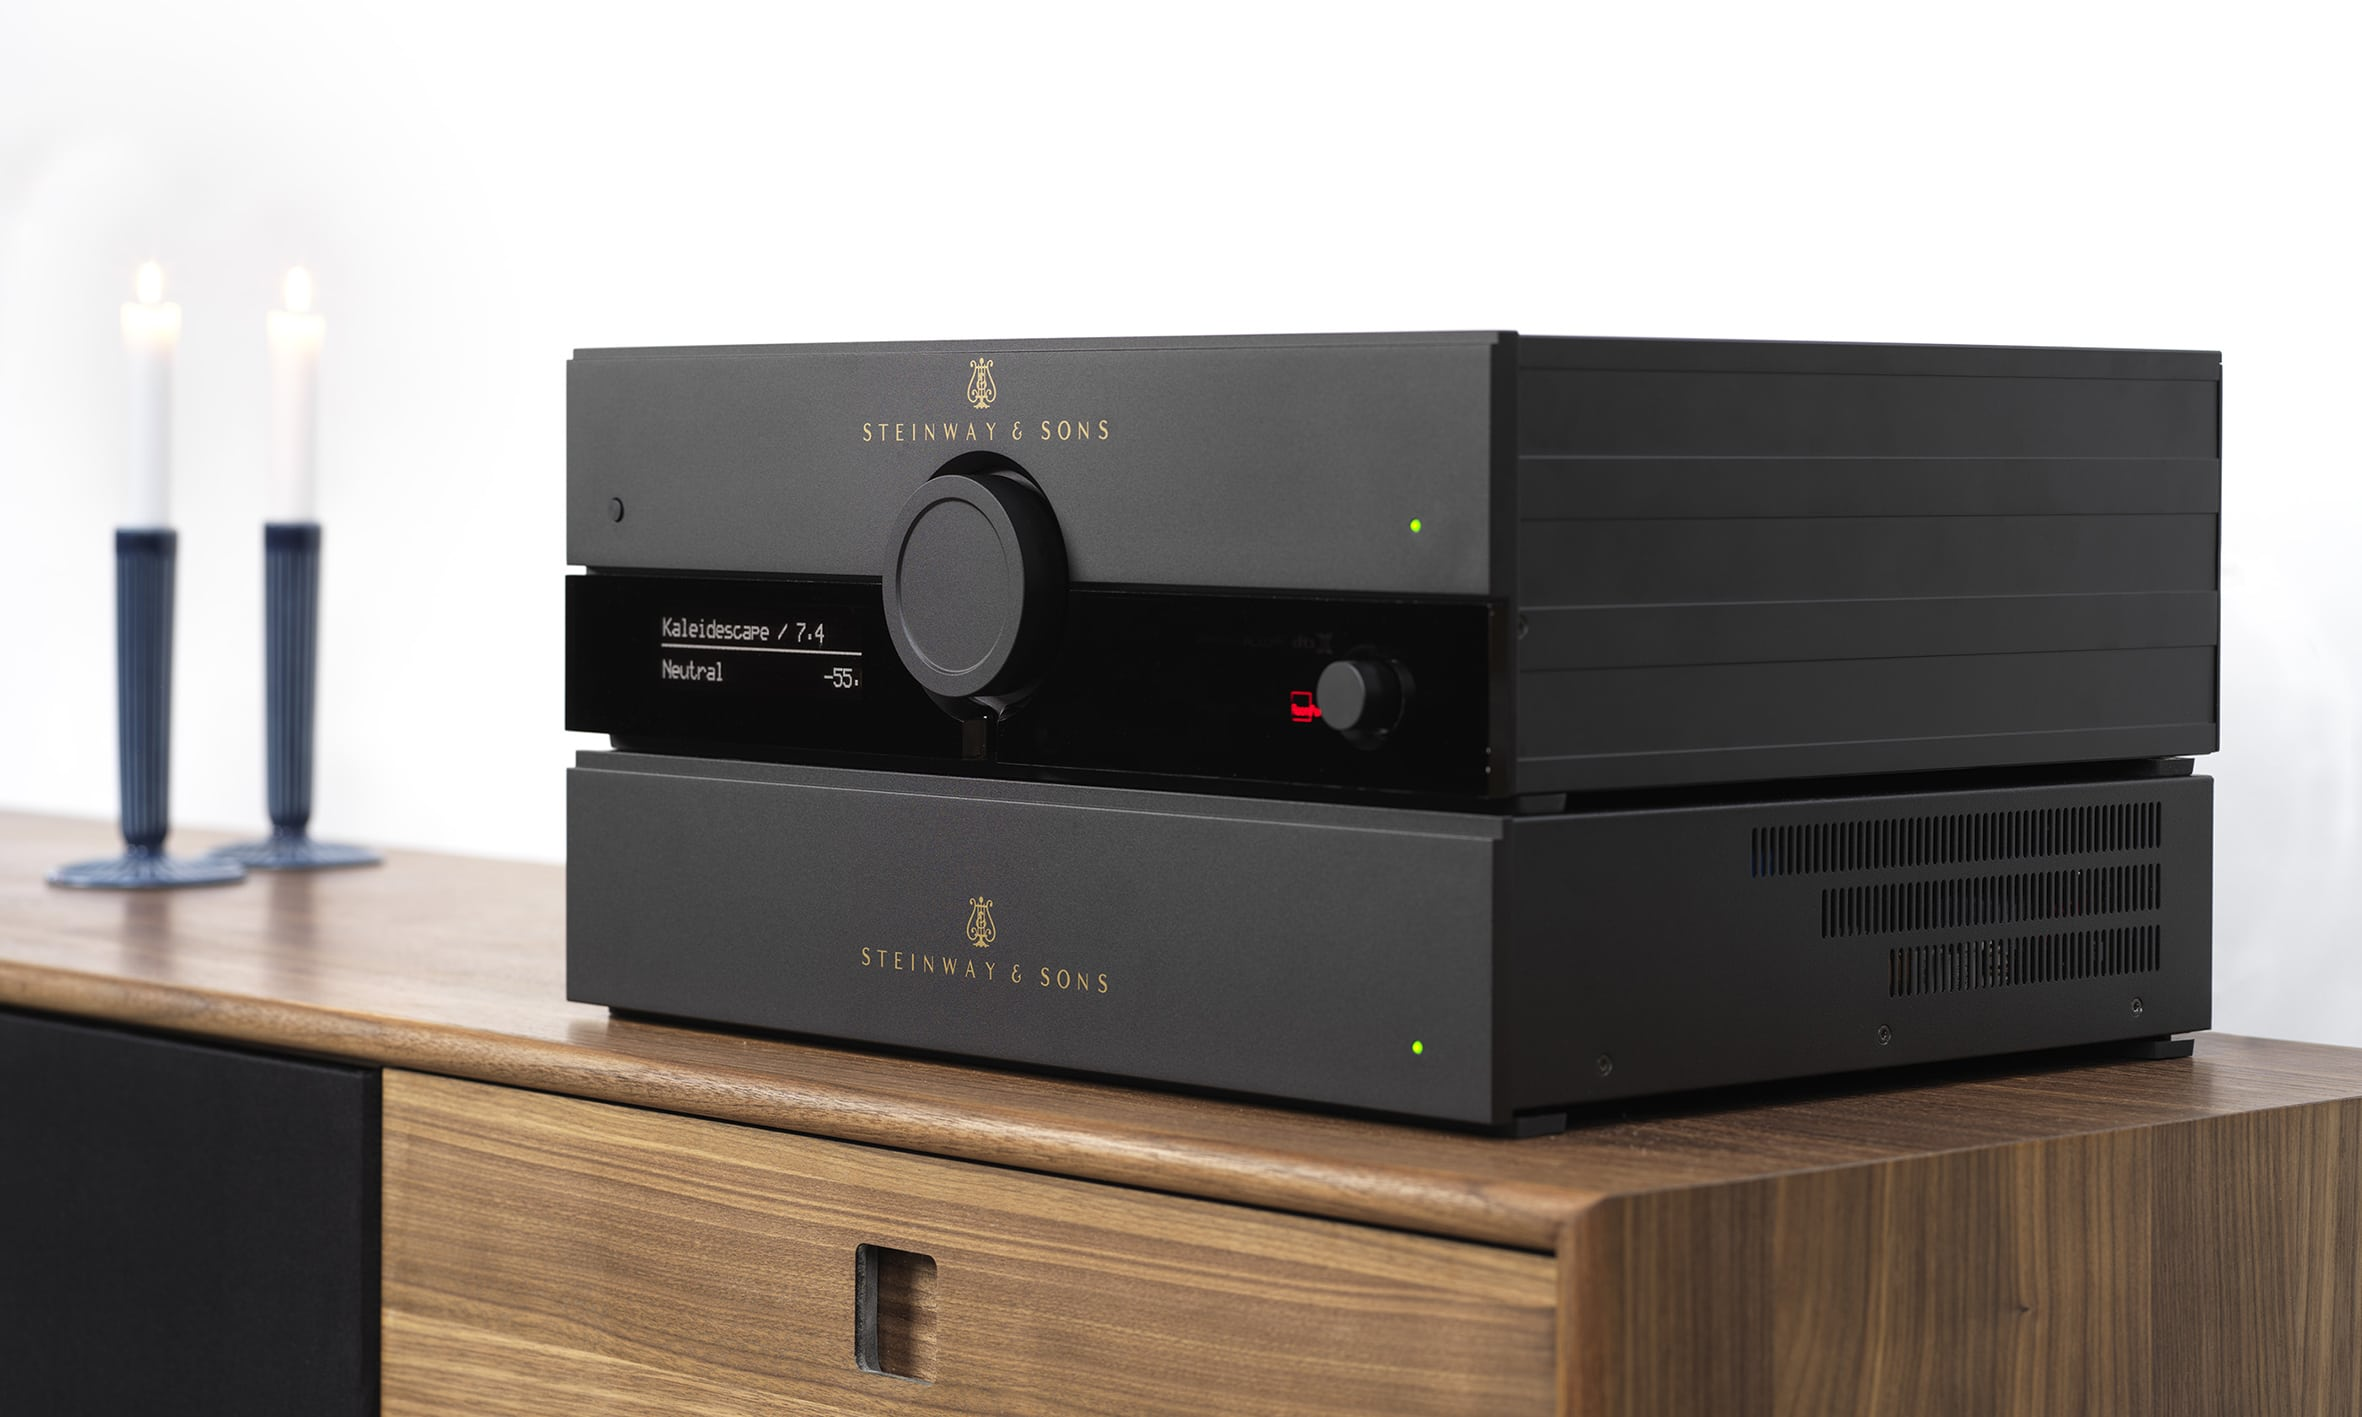 Steinway Lyngdorf 最新款處理器將在 2019 年 CEDIA 上發布